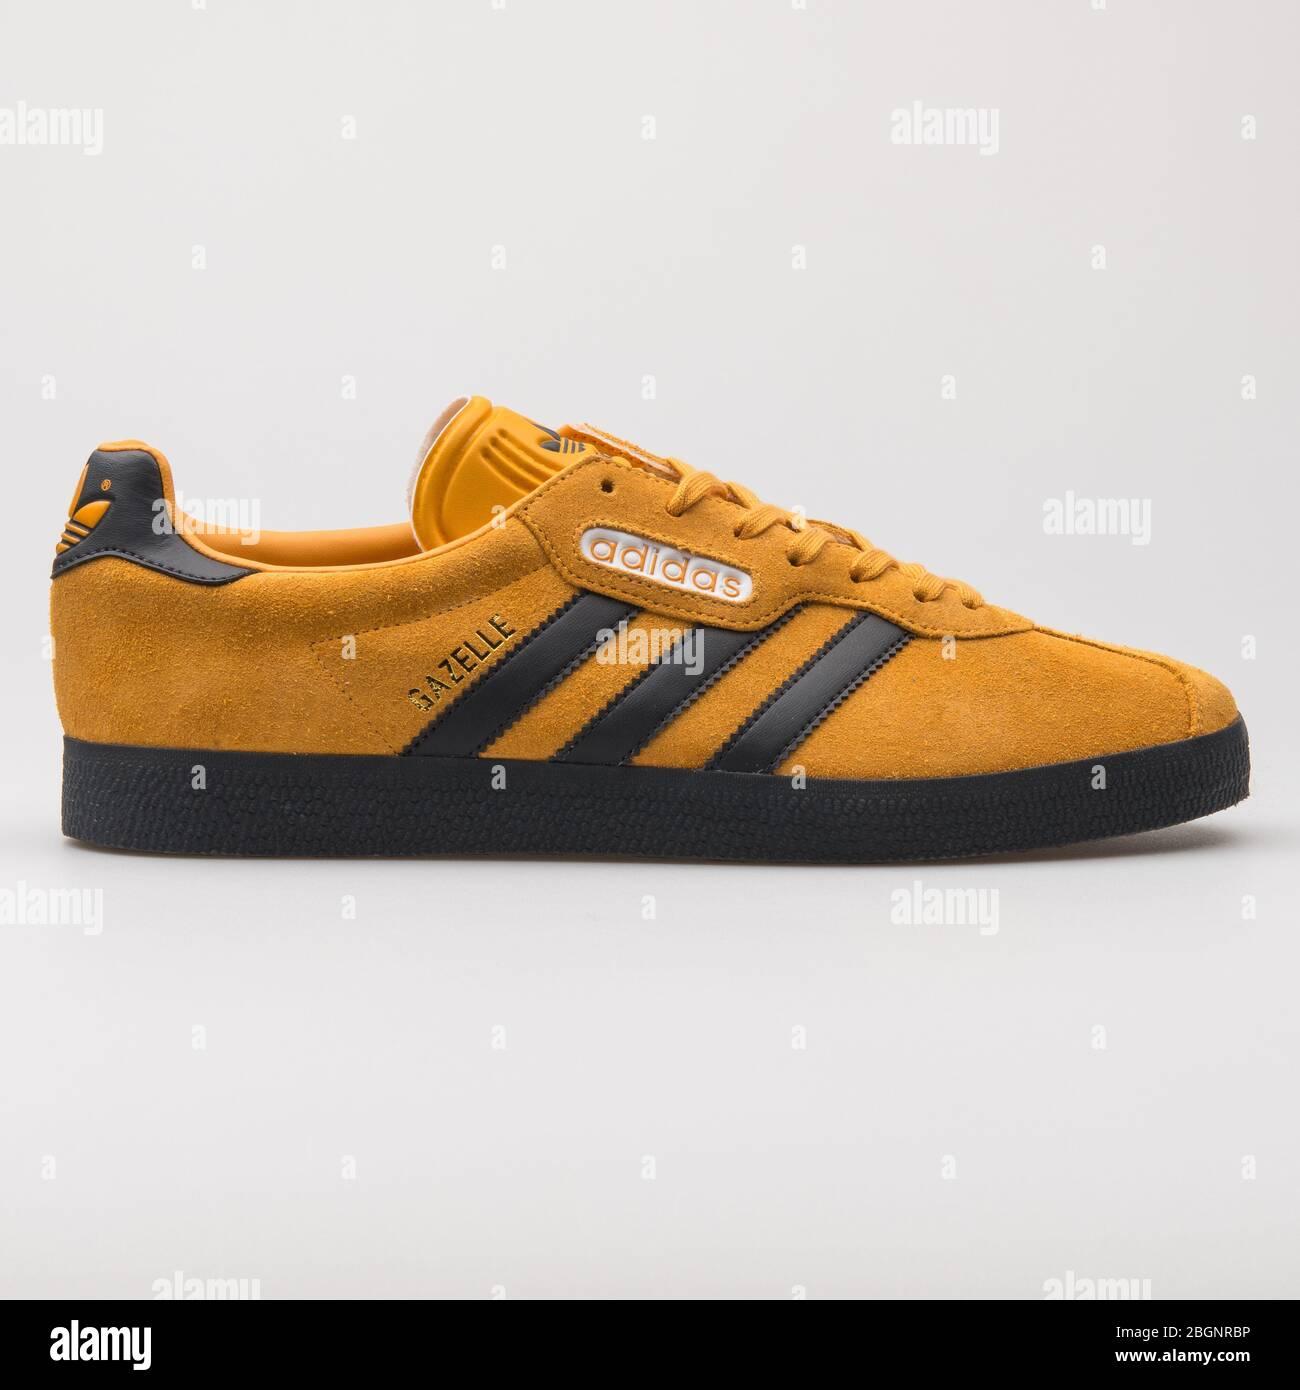 Adidas Gazelle orange and black sneaker